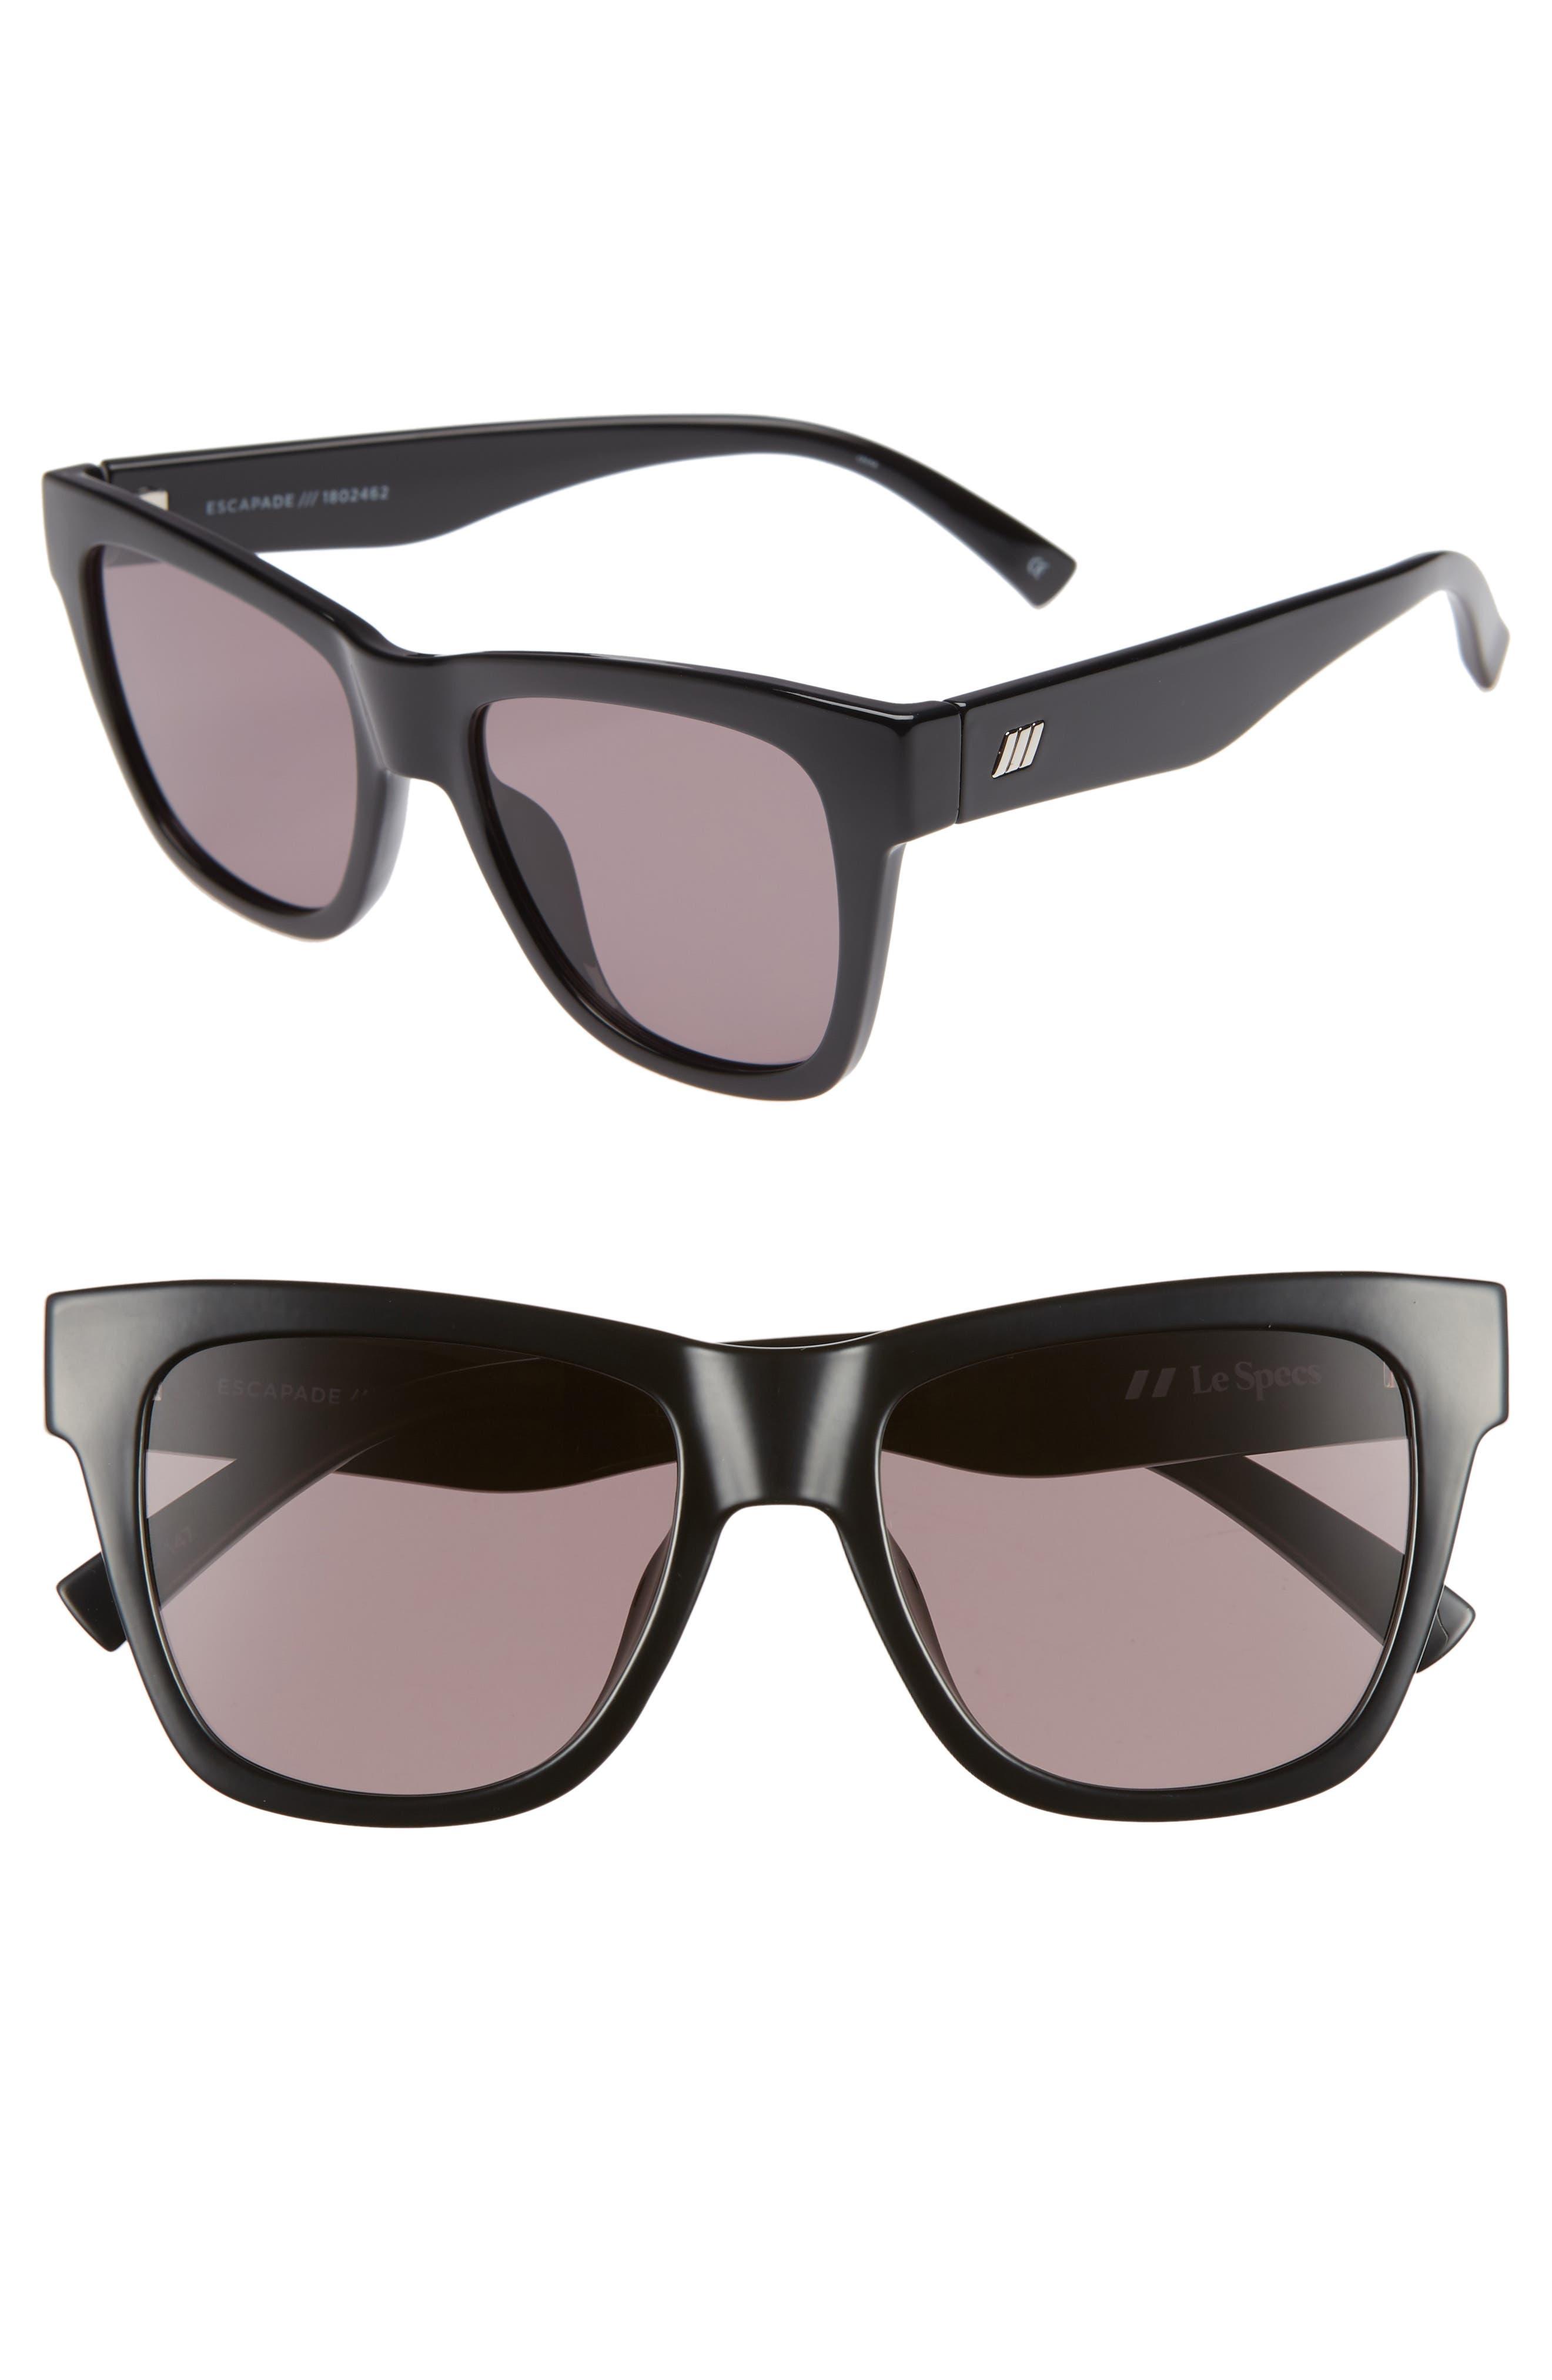 Le Specs Escapade 5m Sunglasses - Black